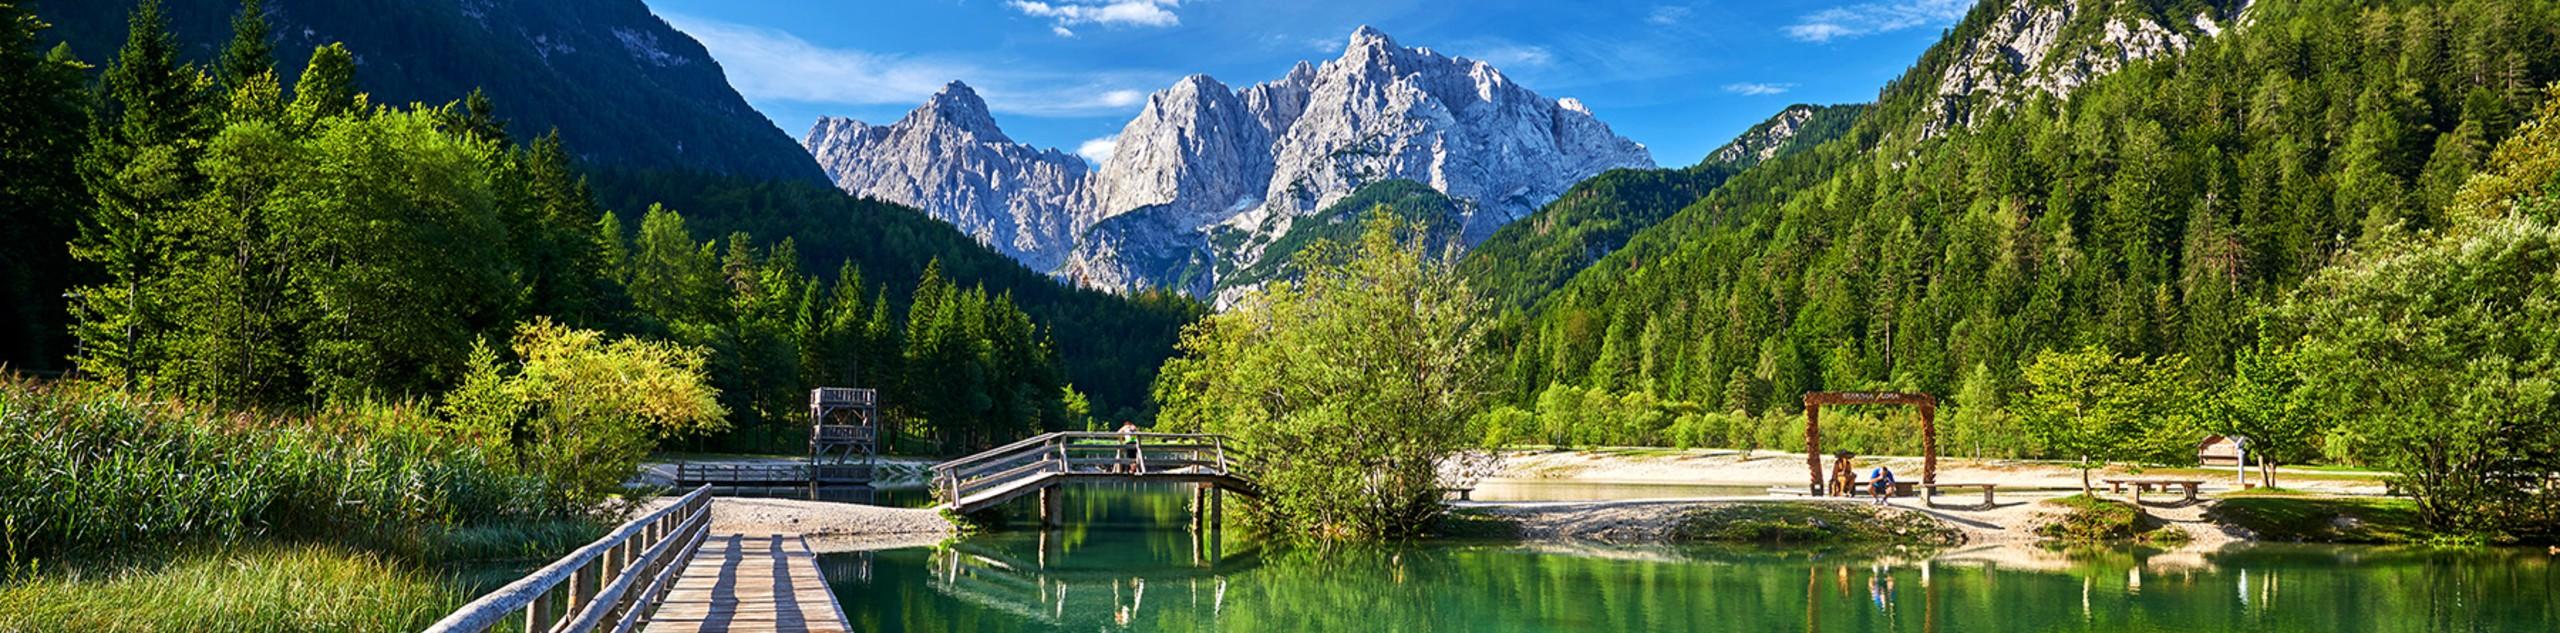 Exploring Slovenia by Bike